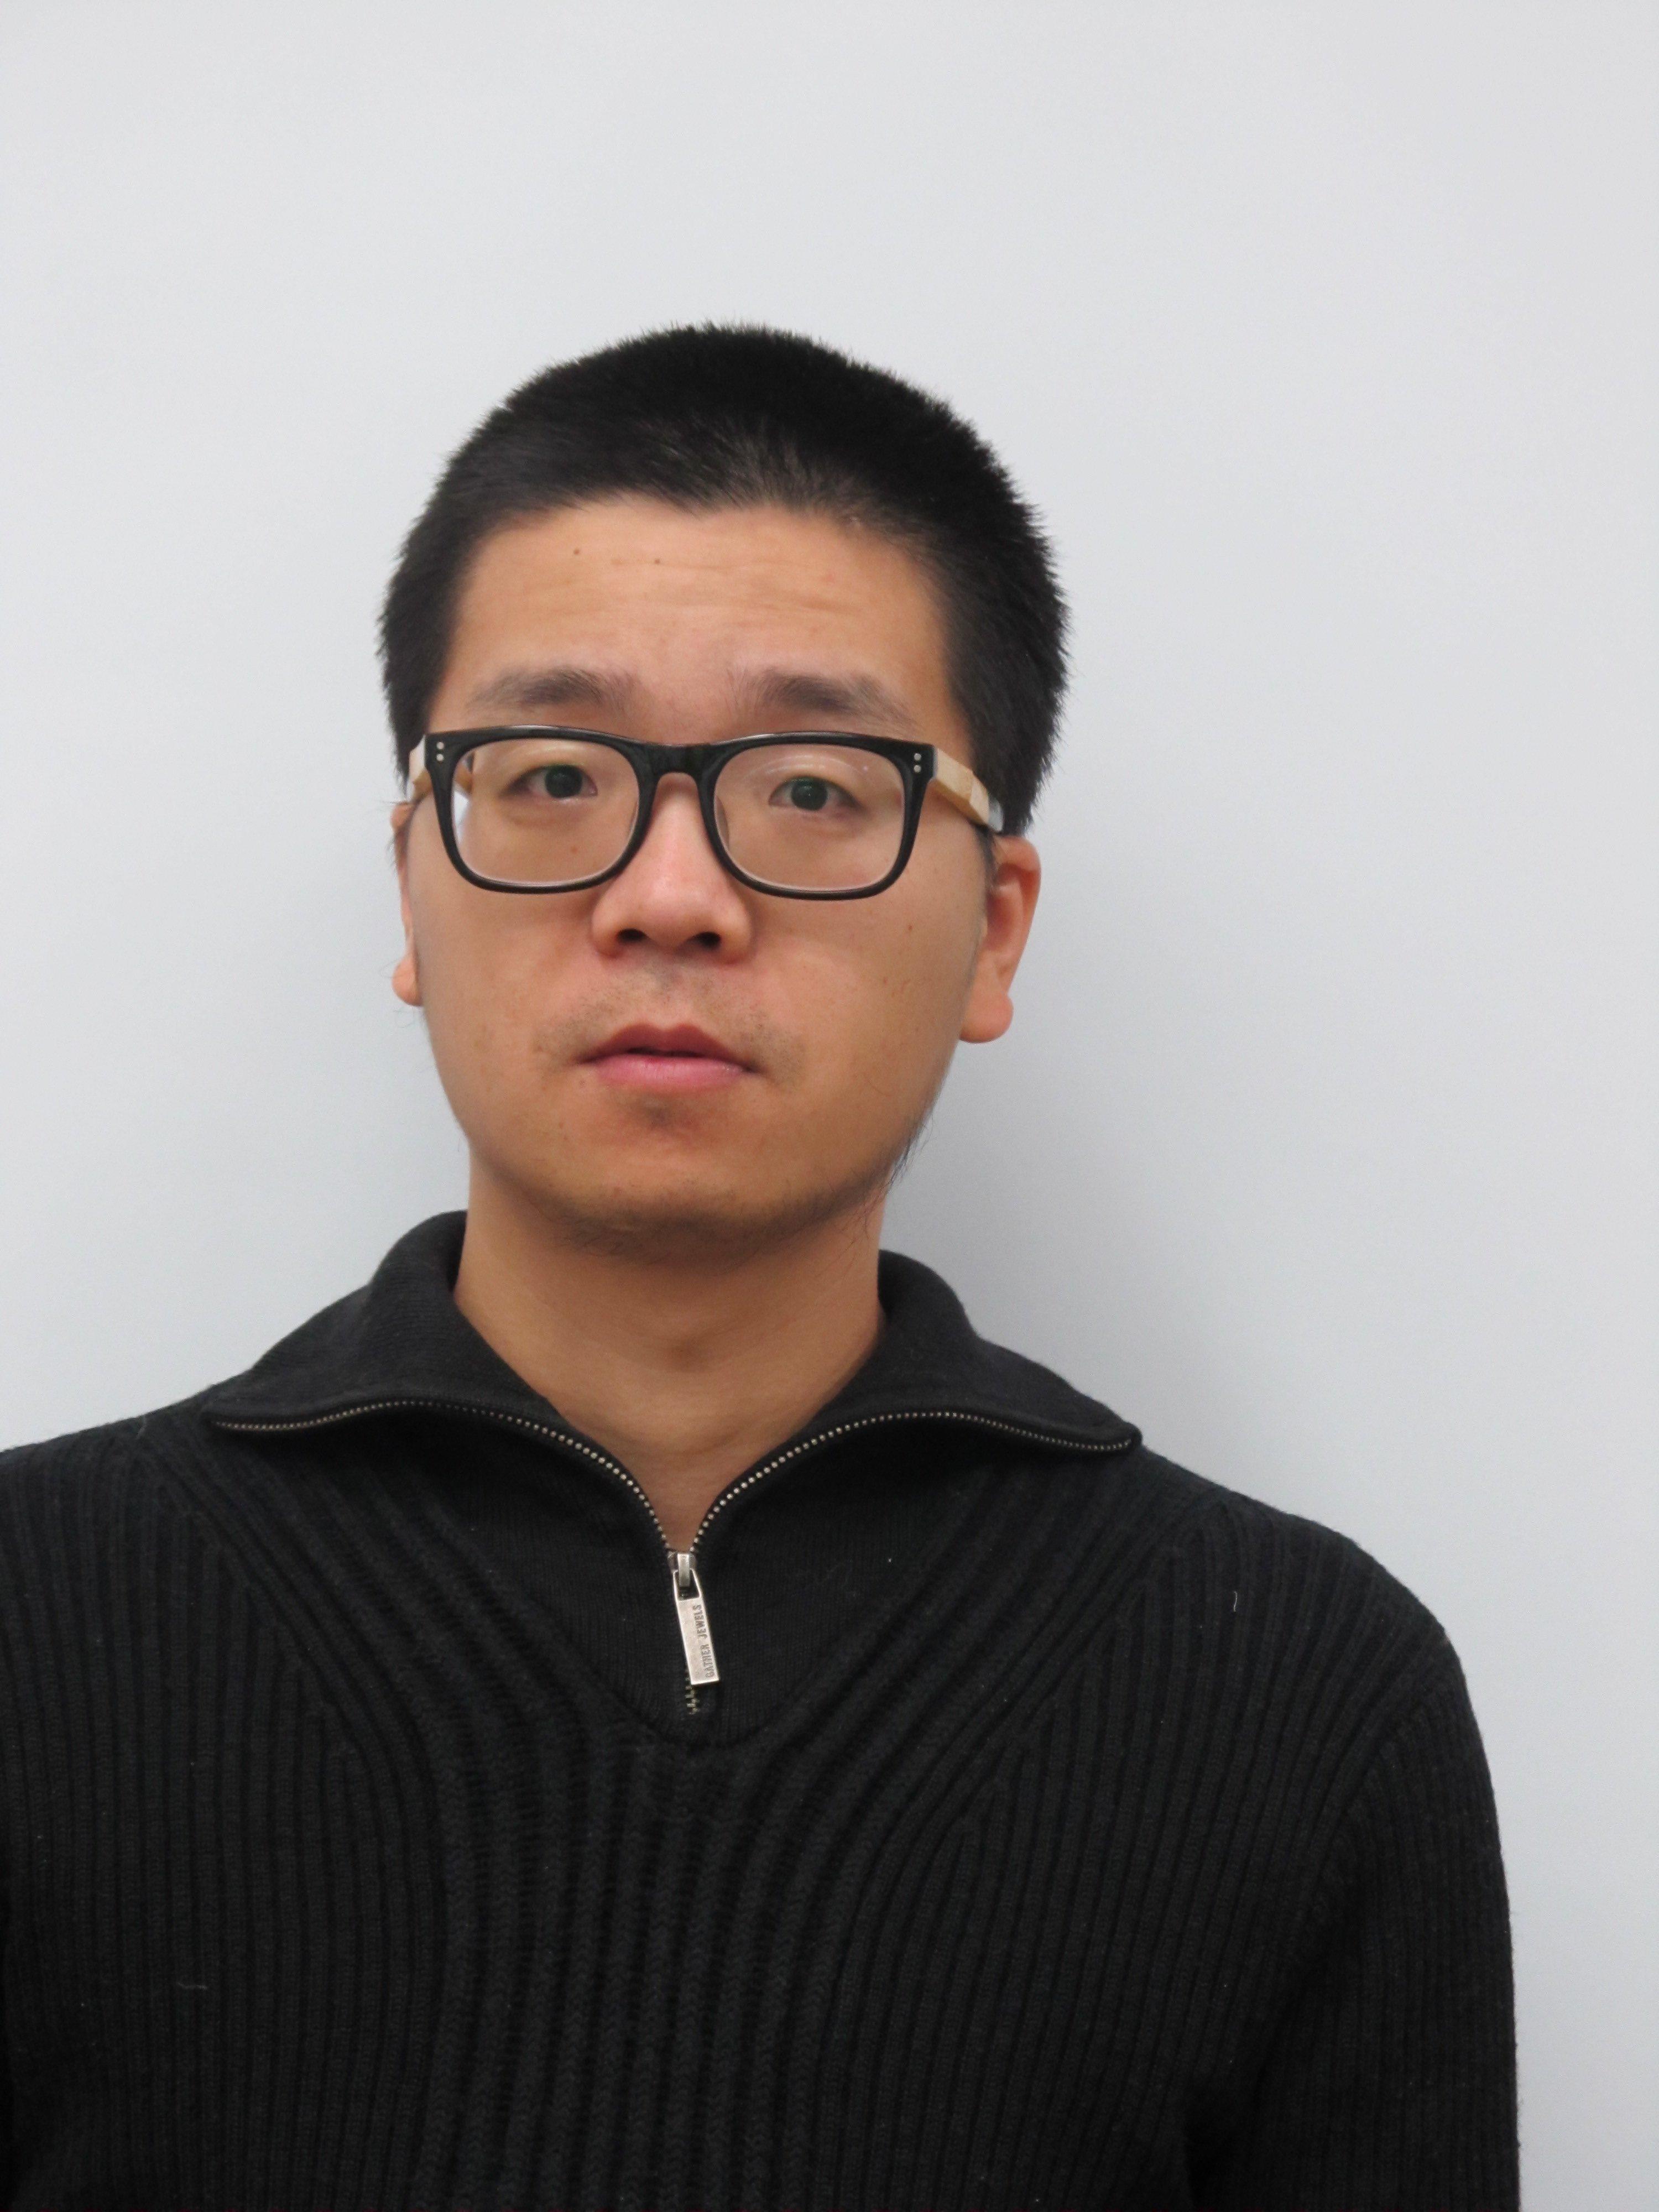 Students - Jie (Kevin) Yan